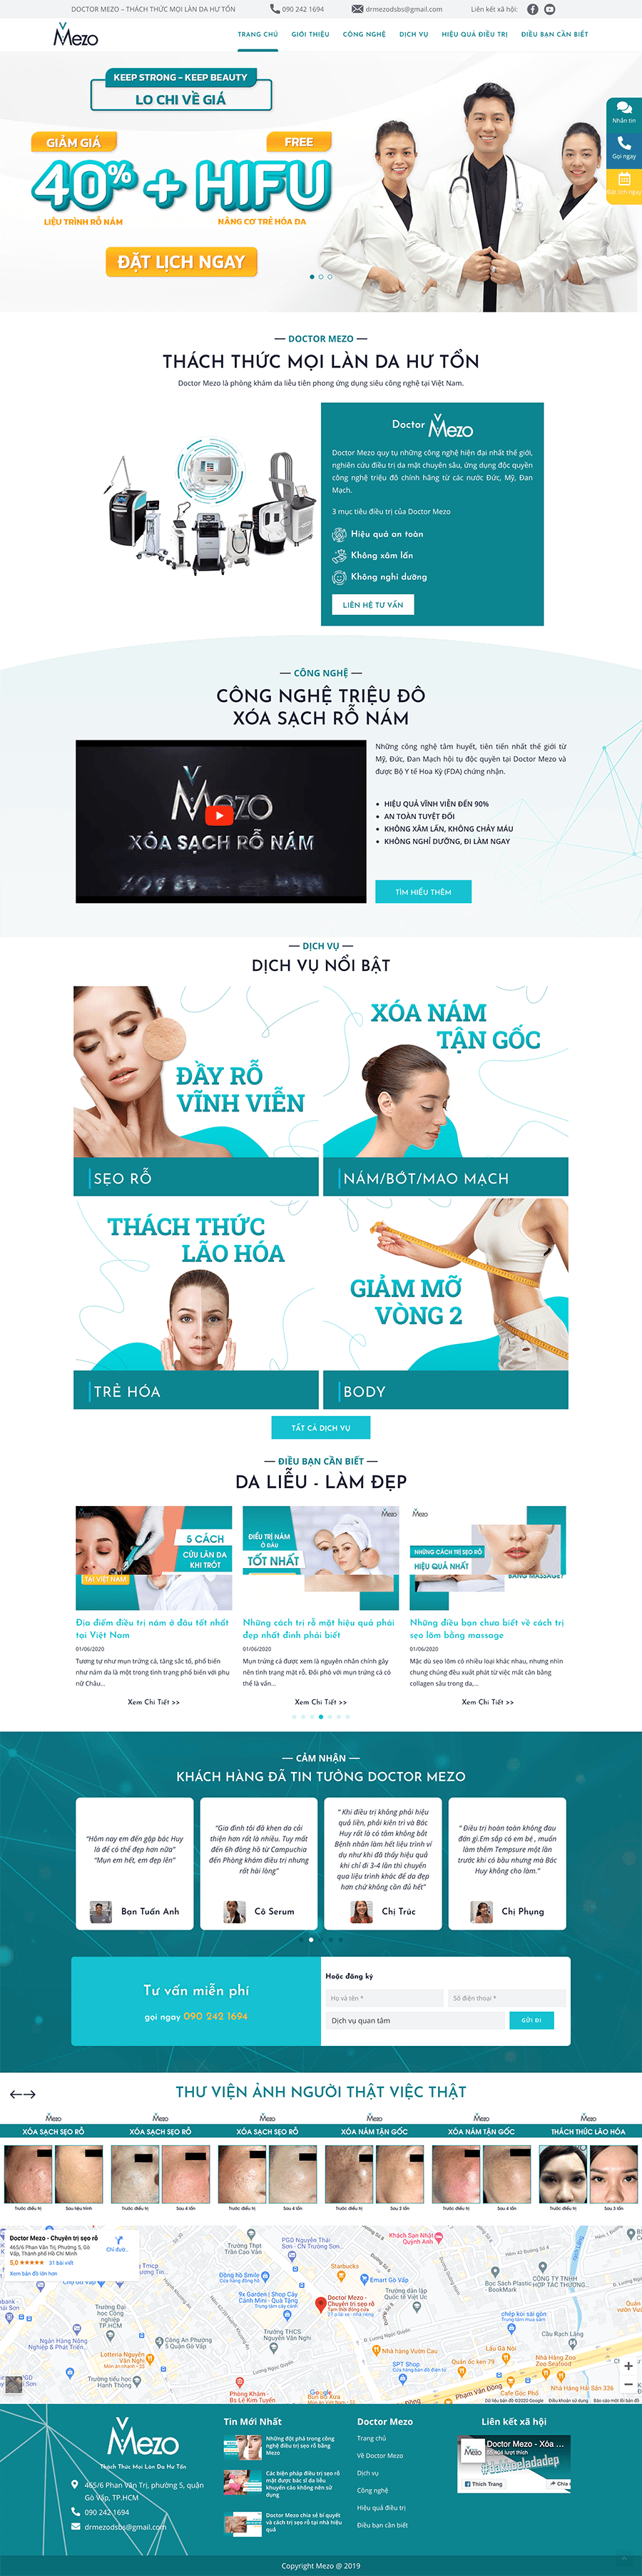 Dự án Spa – Chăm sóc sắc đẹp Doctor Mezo